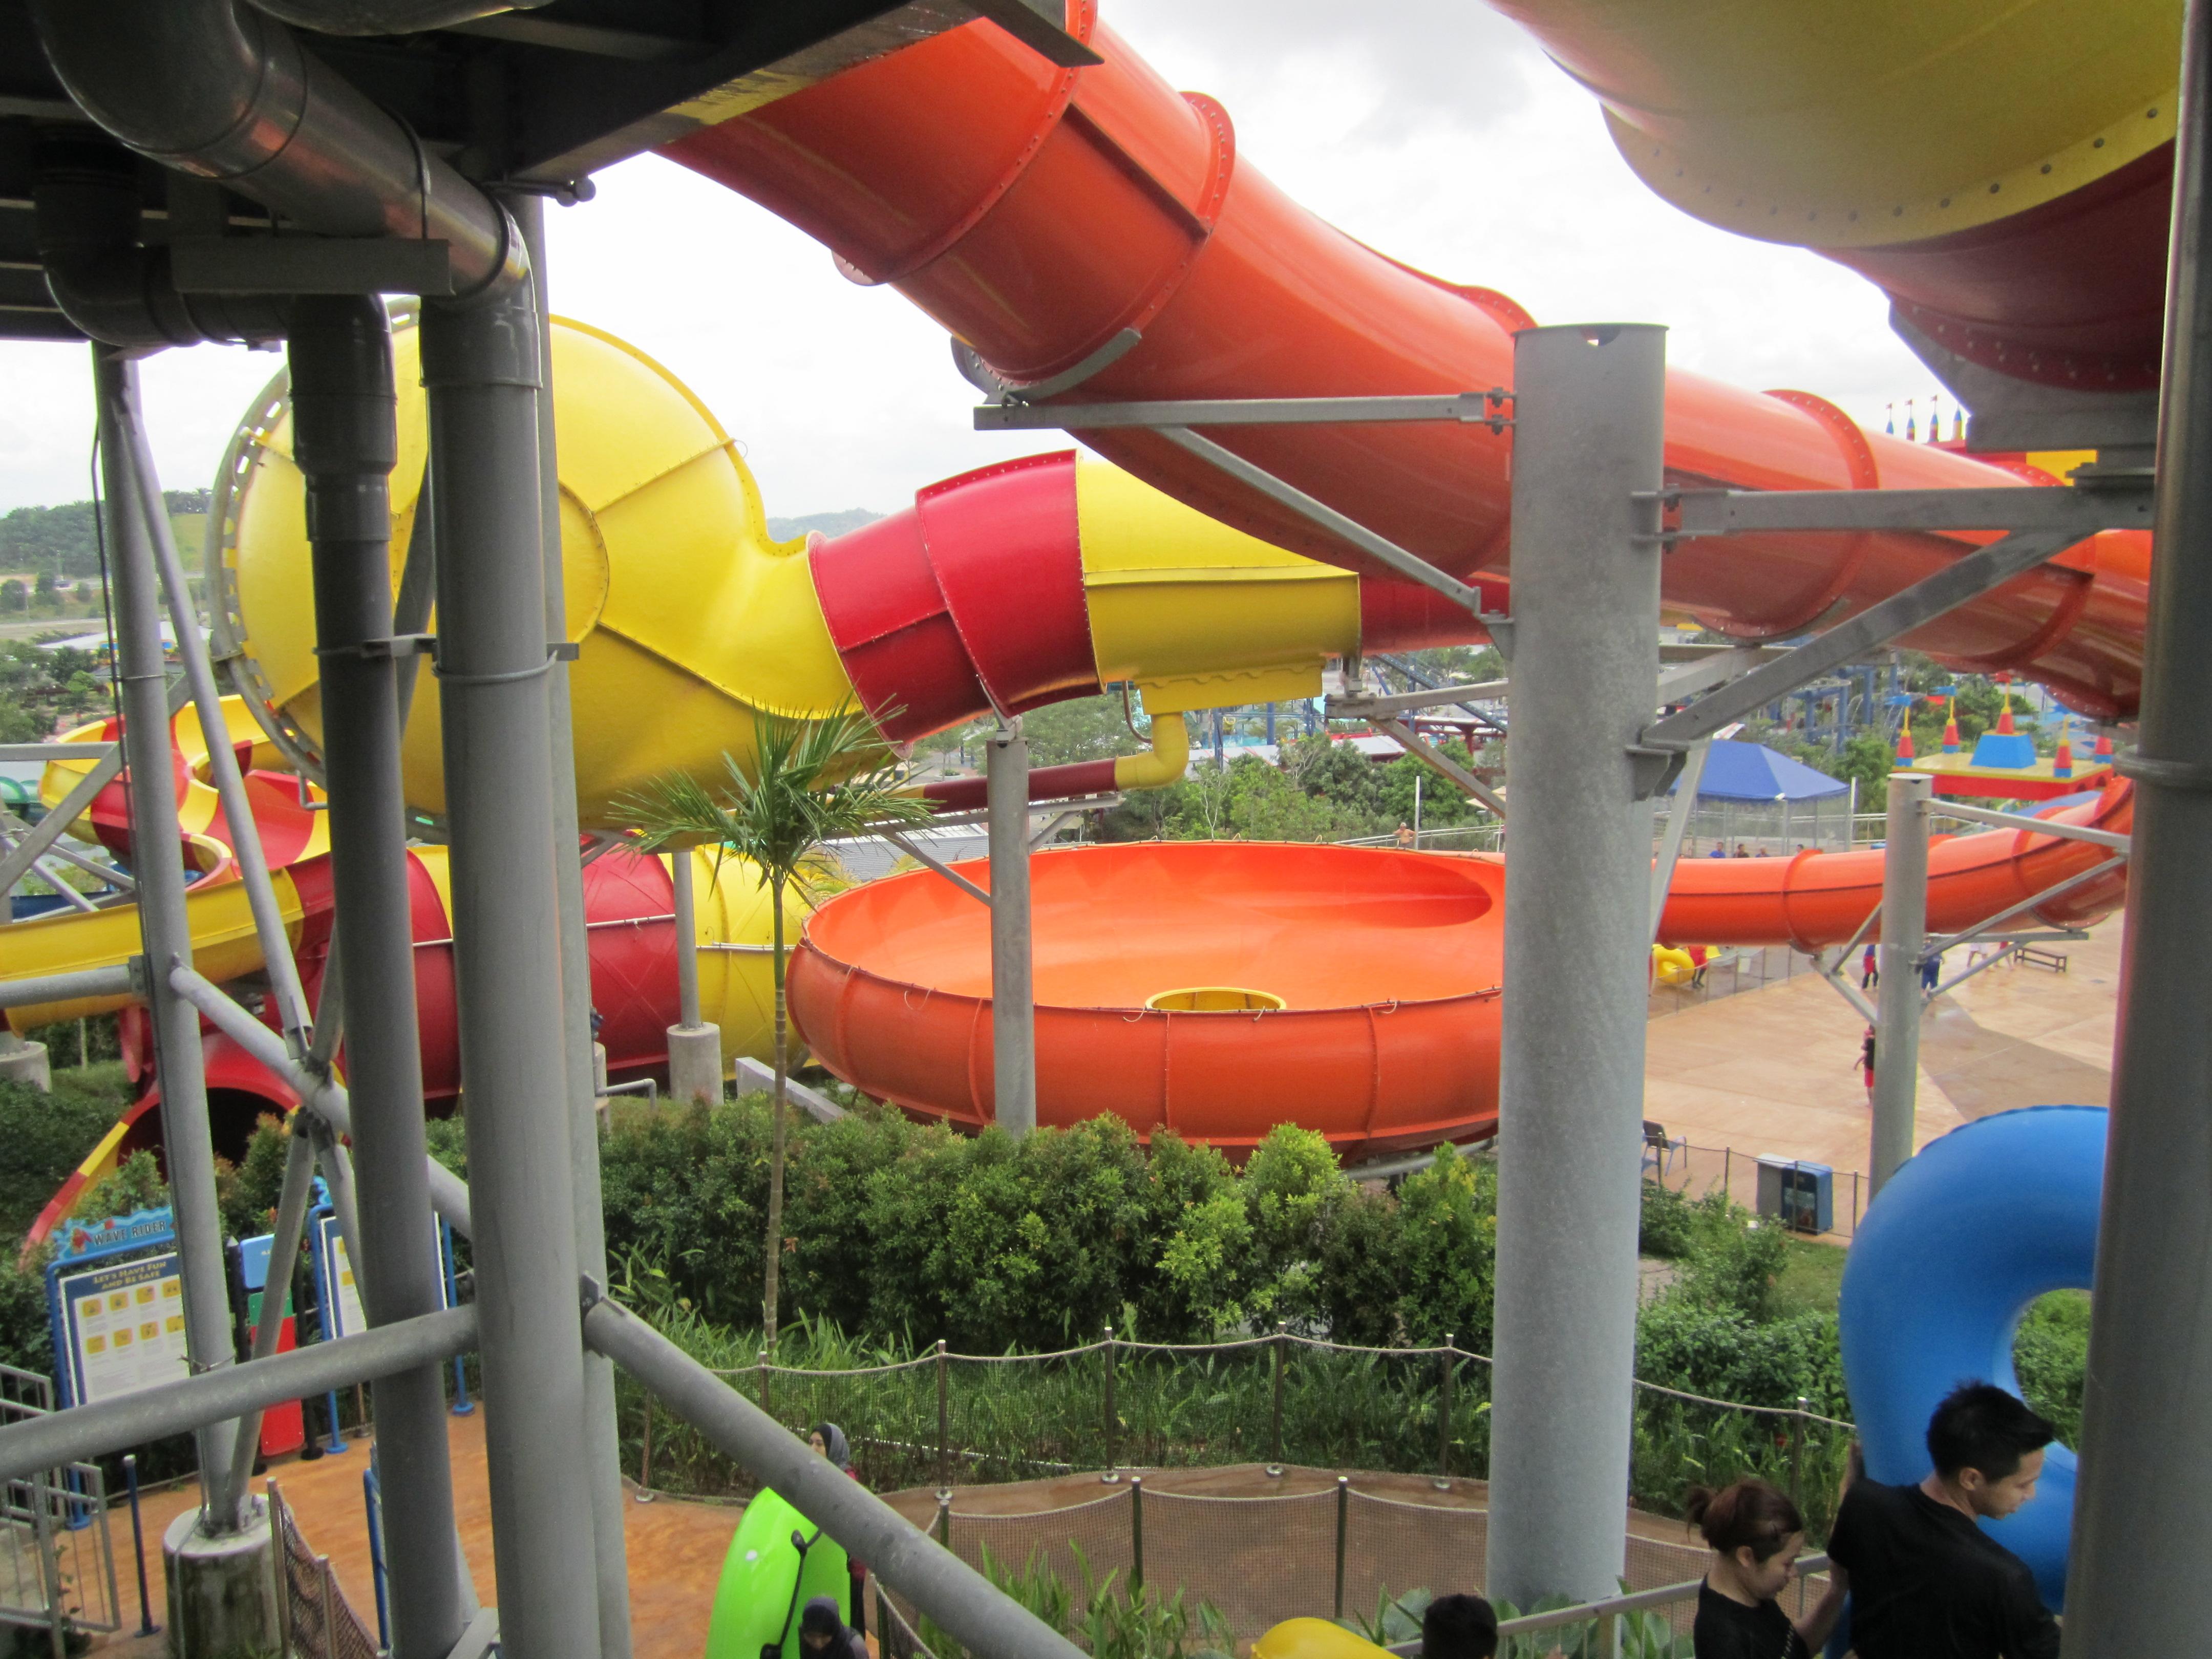 Review: Legoland Malaysia Water Park - Jay's Brick Blog